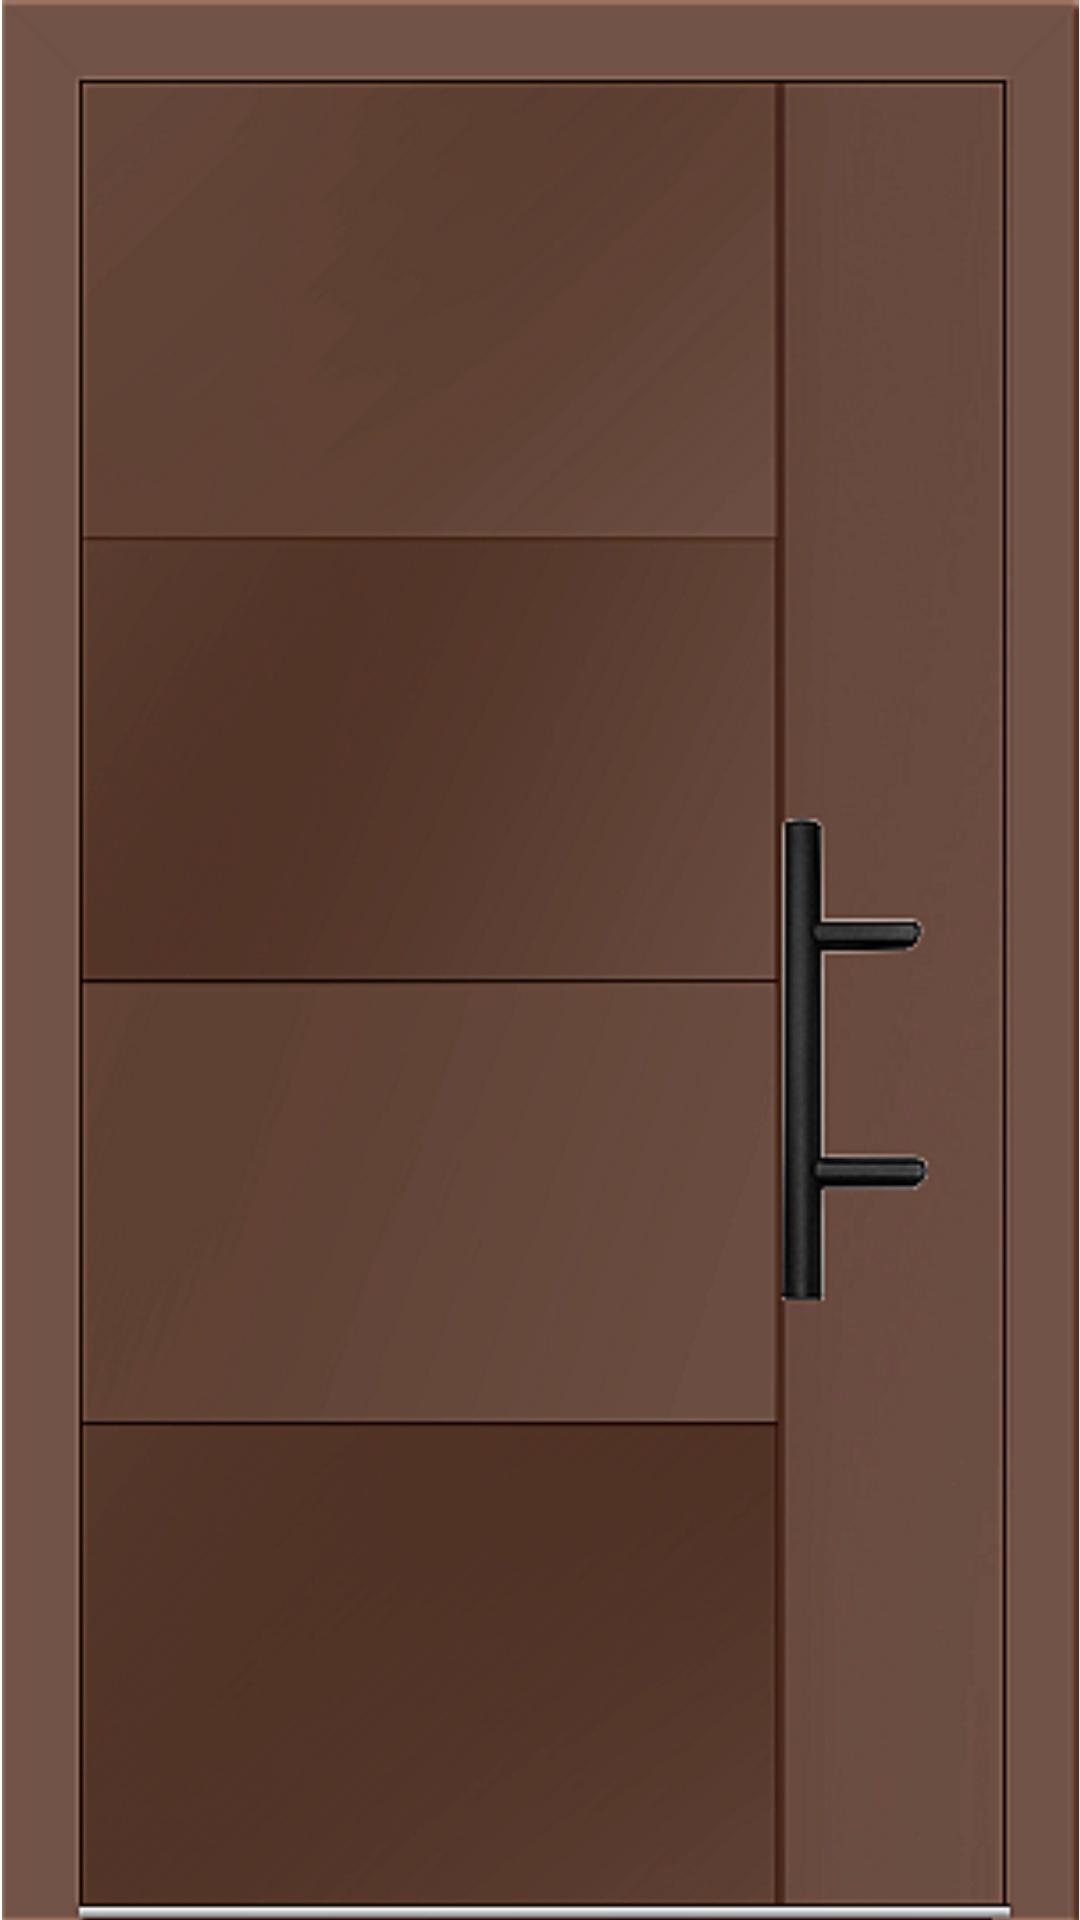 Holz-Alu Haustür Modell 66874 lehmbraun